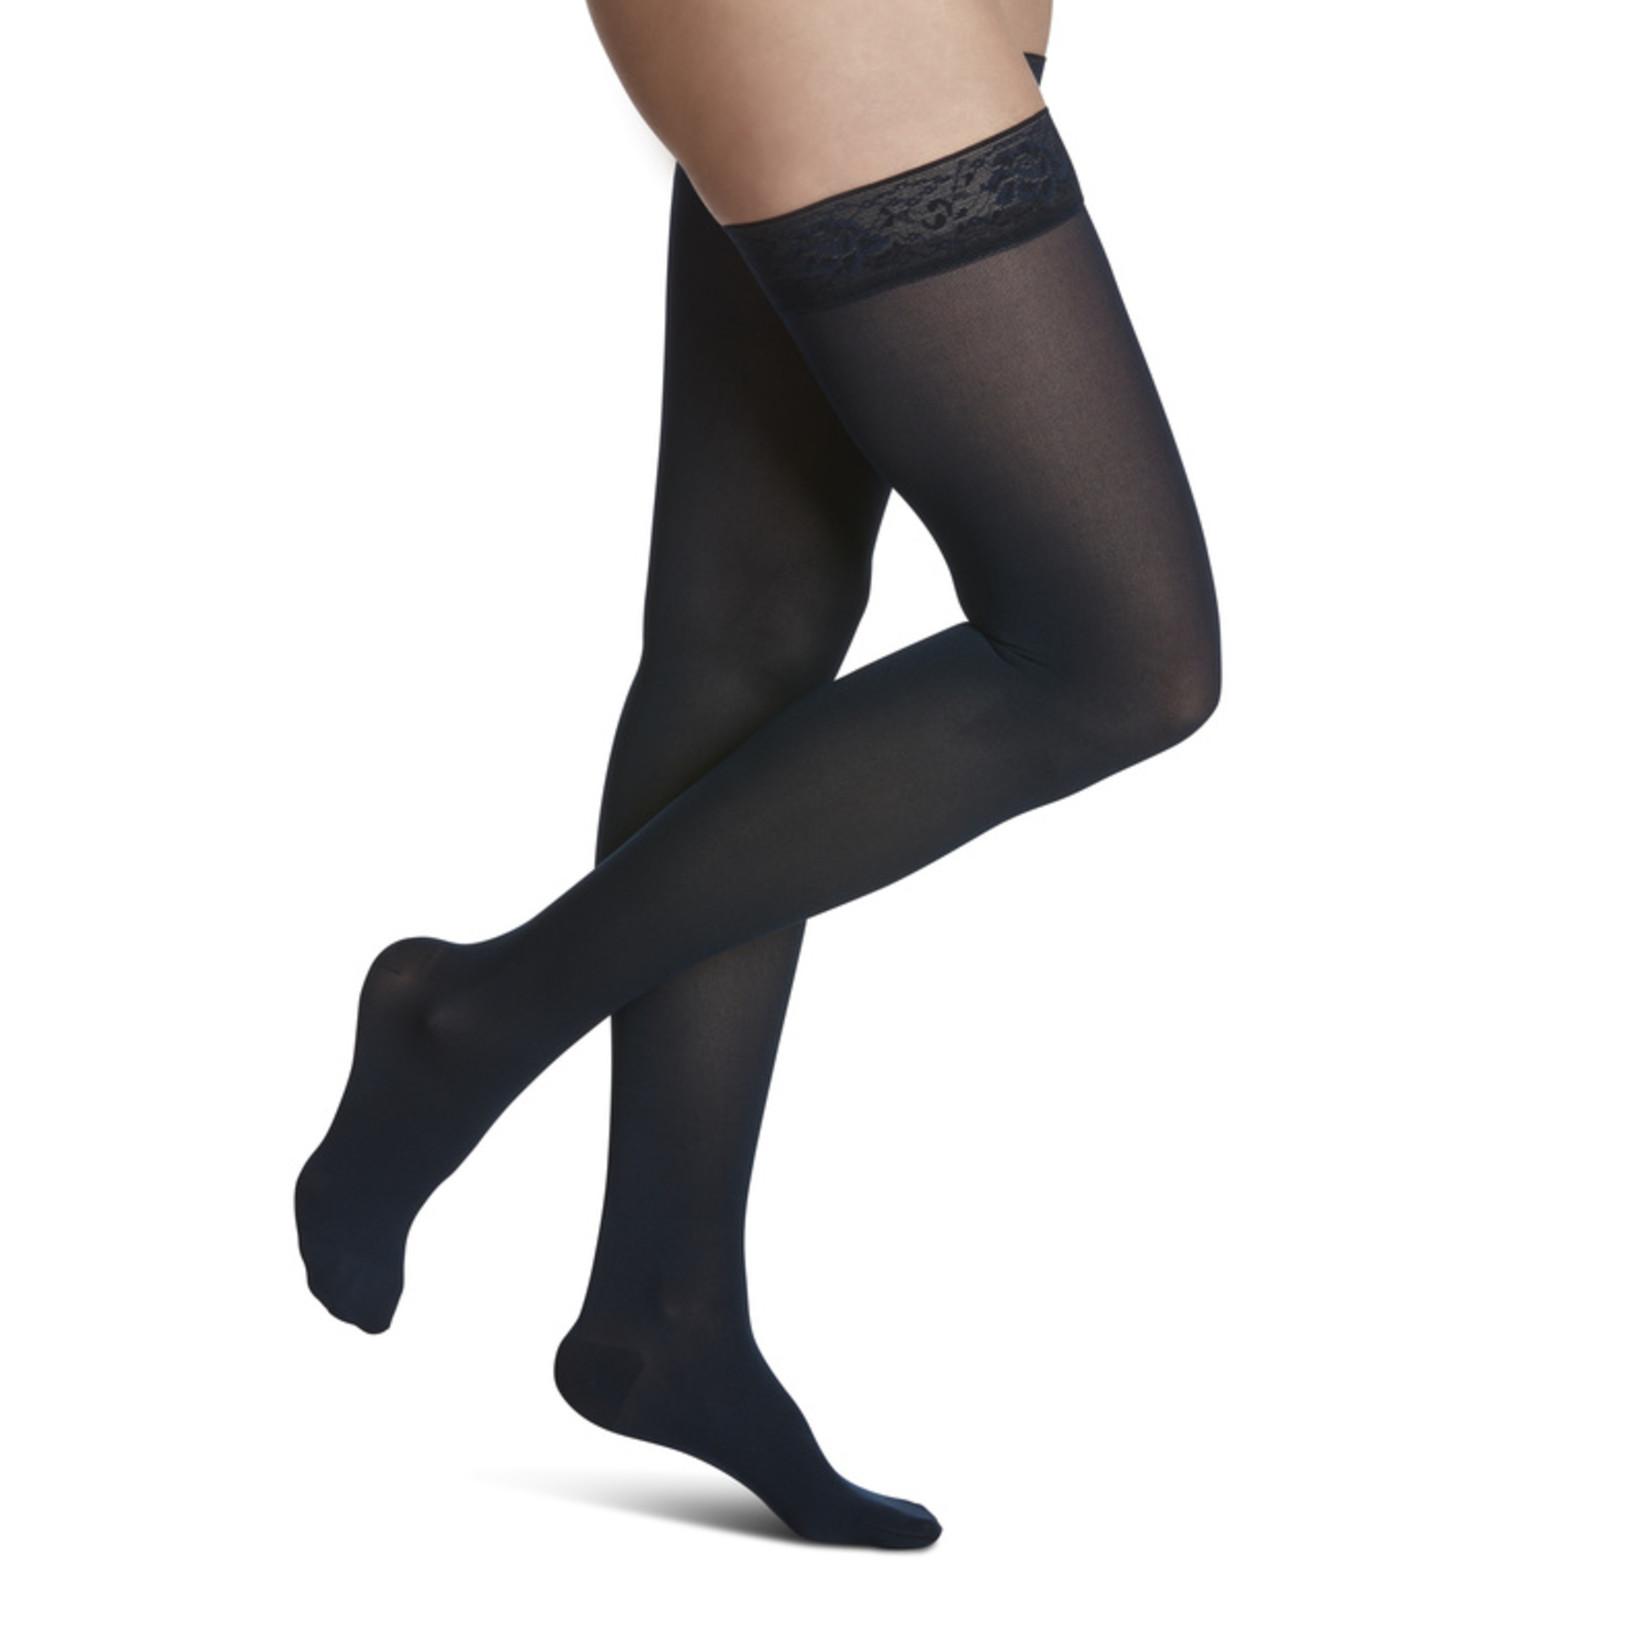 SIGVARIS Women's Style Soft Opaque Thigh-High 15-20mmHg